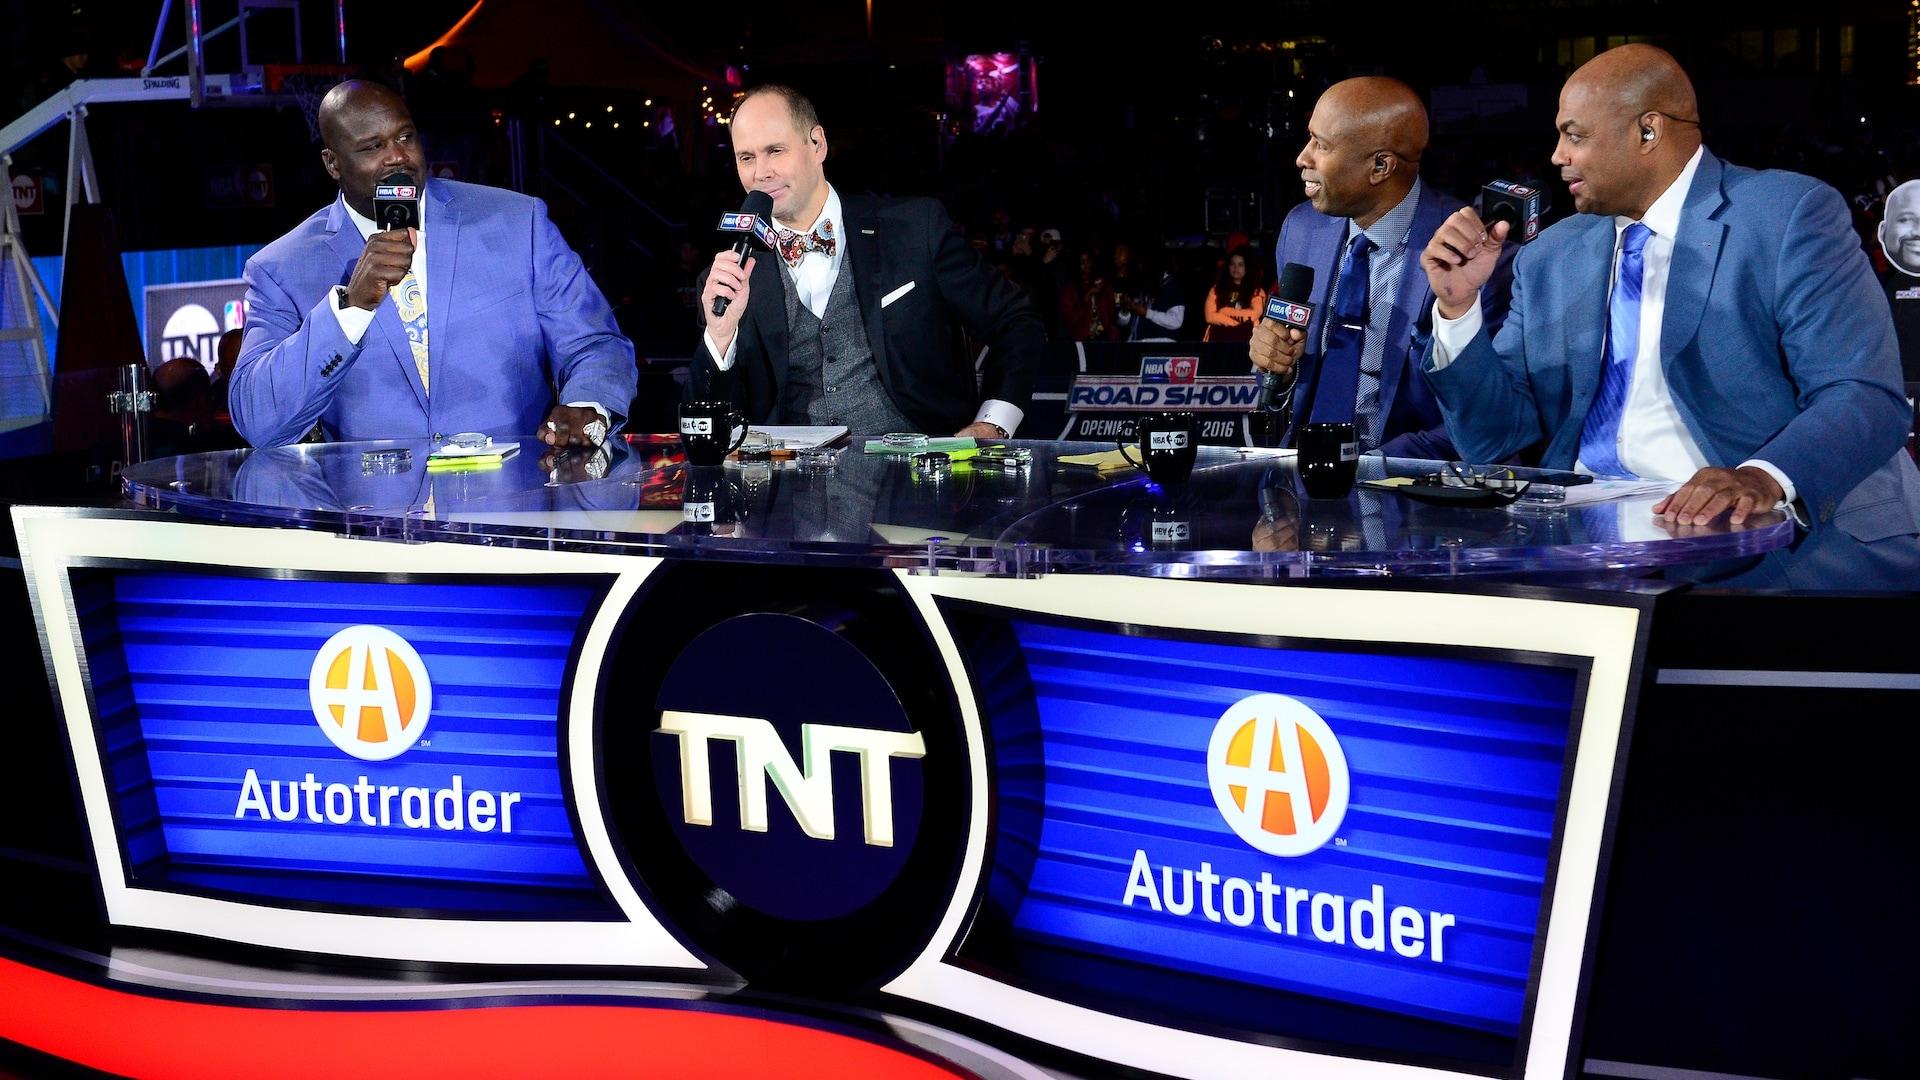 'Inside The NBA' studio shows return starting on July 7